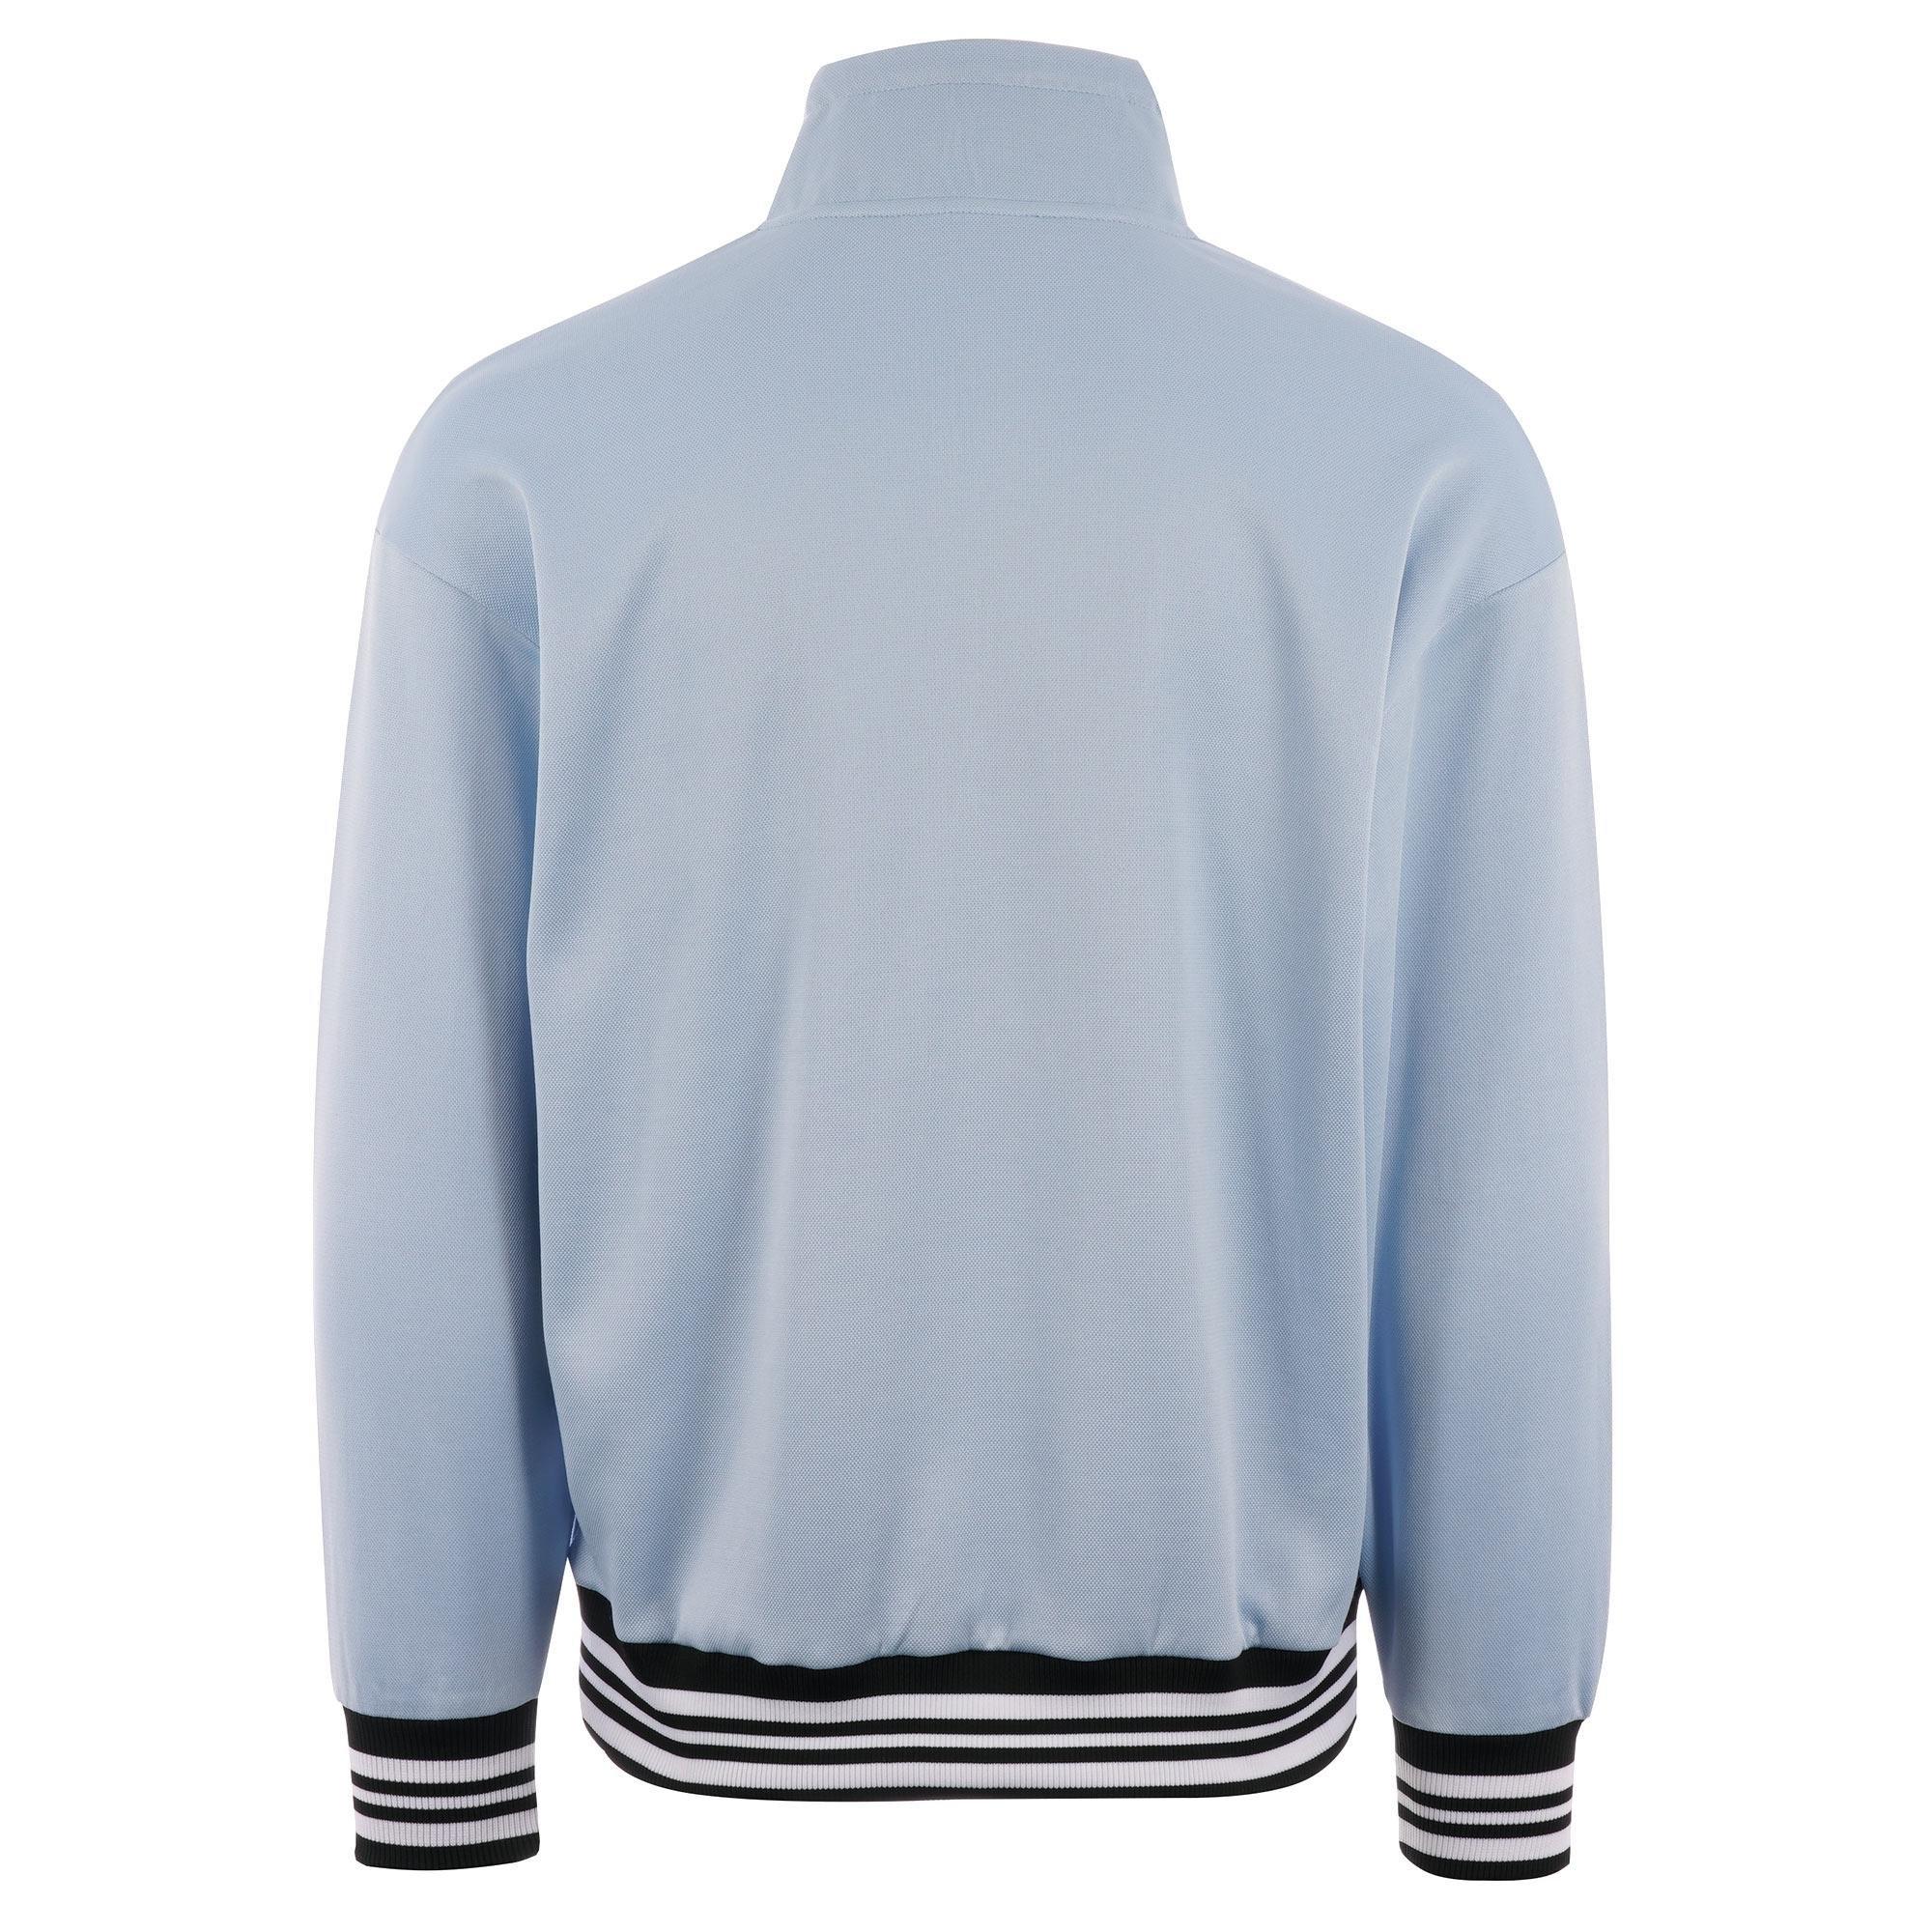 ae6a0e77f015 Fila Vintage - Cole Half Zip Sweatshirt - Cashmere Blue for Men - Lyst.  View fullscreen